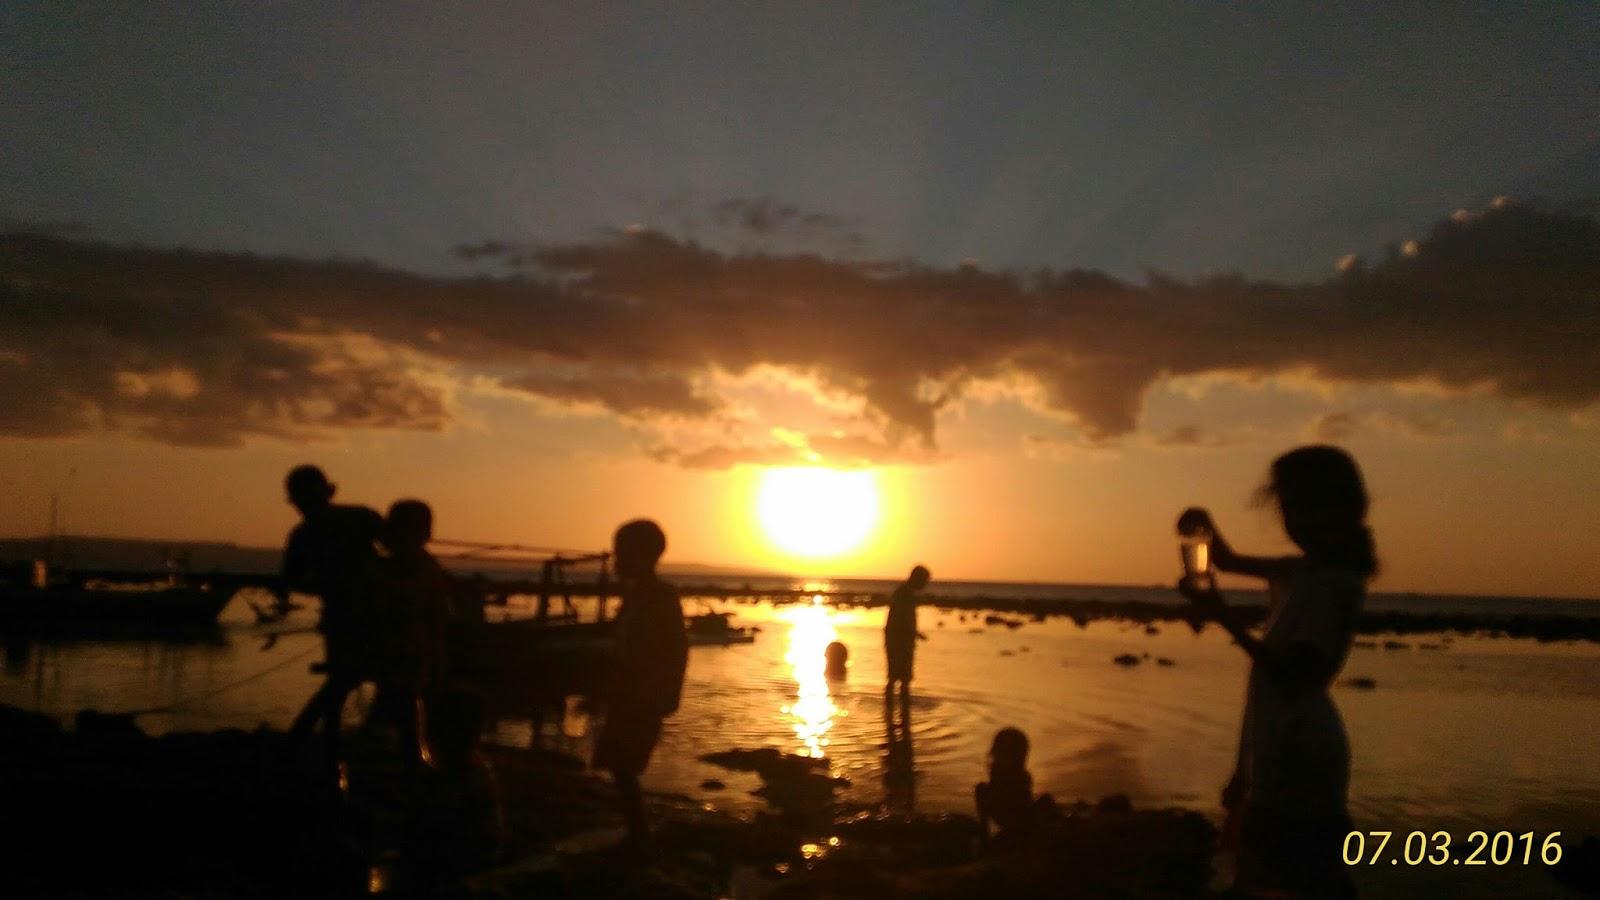 Arianto Ntt Sunset Pantai Batu Kepala Tedis Kab Kupang